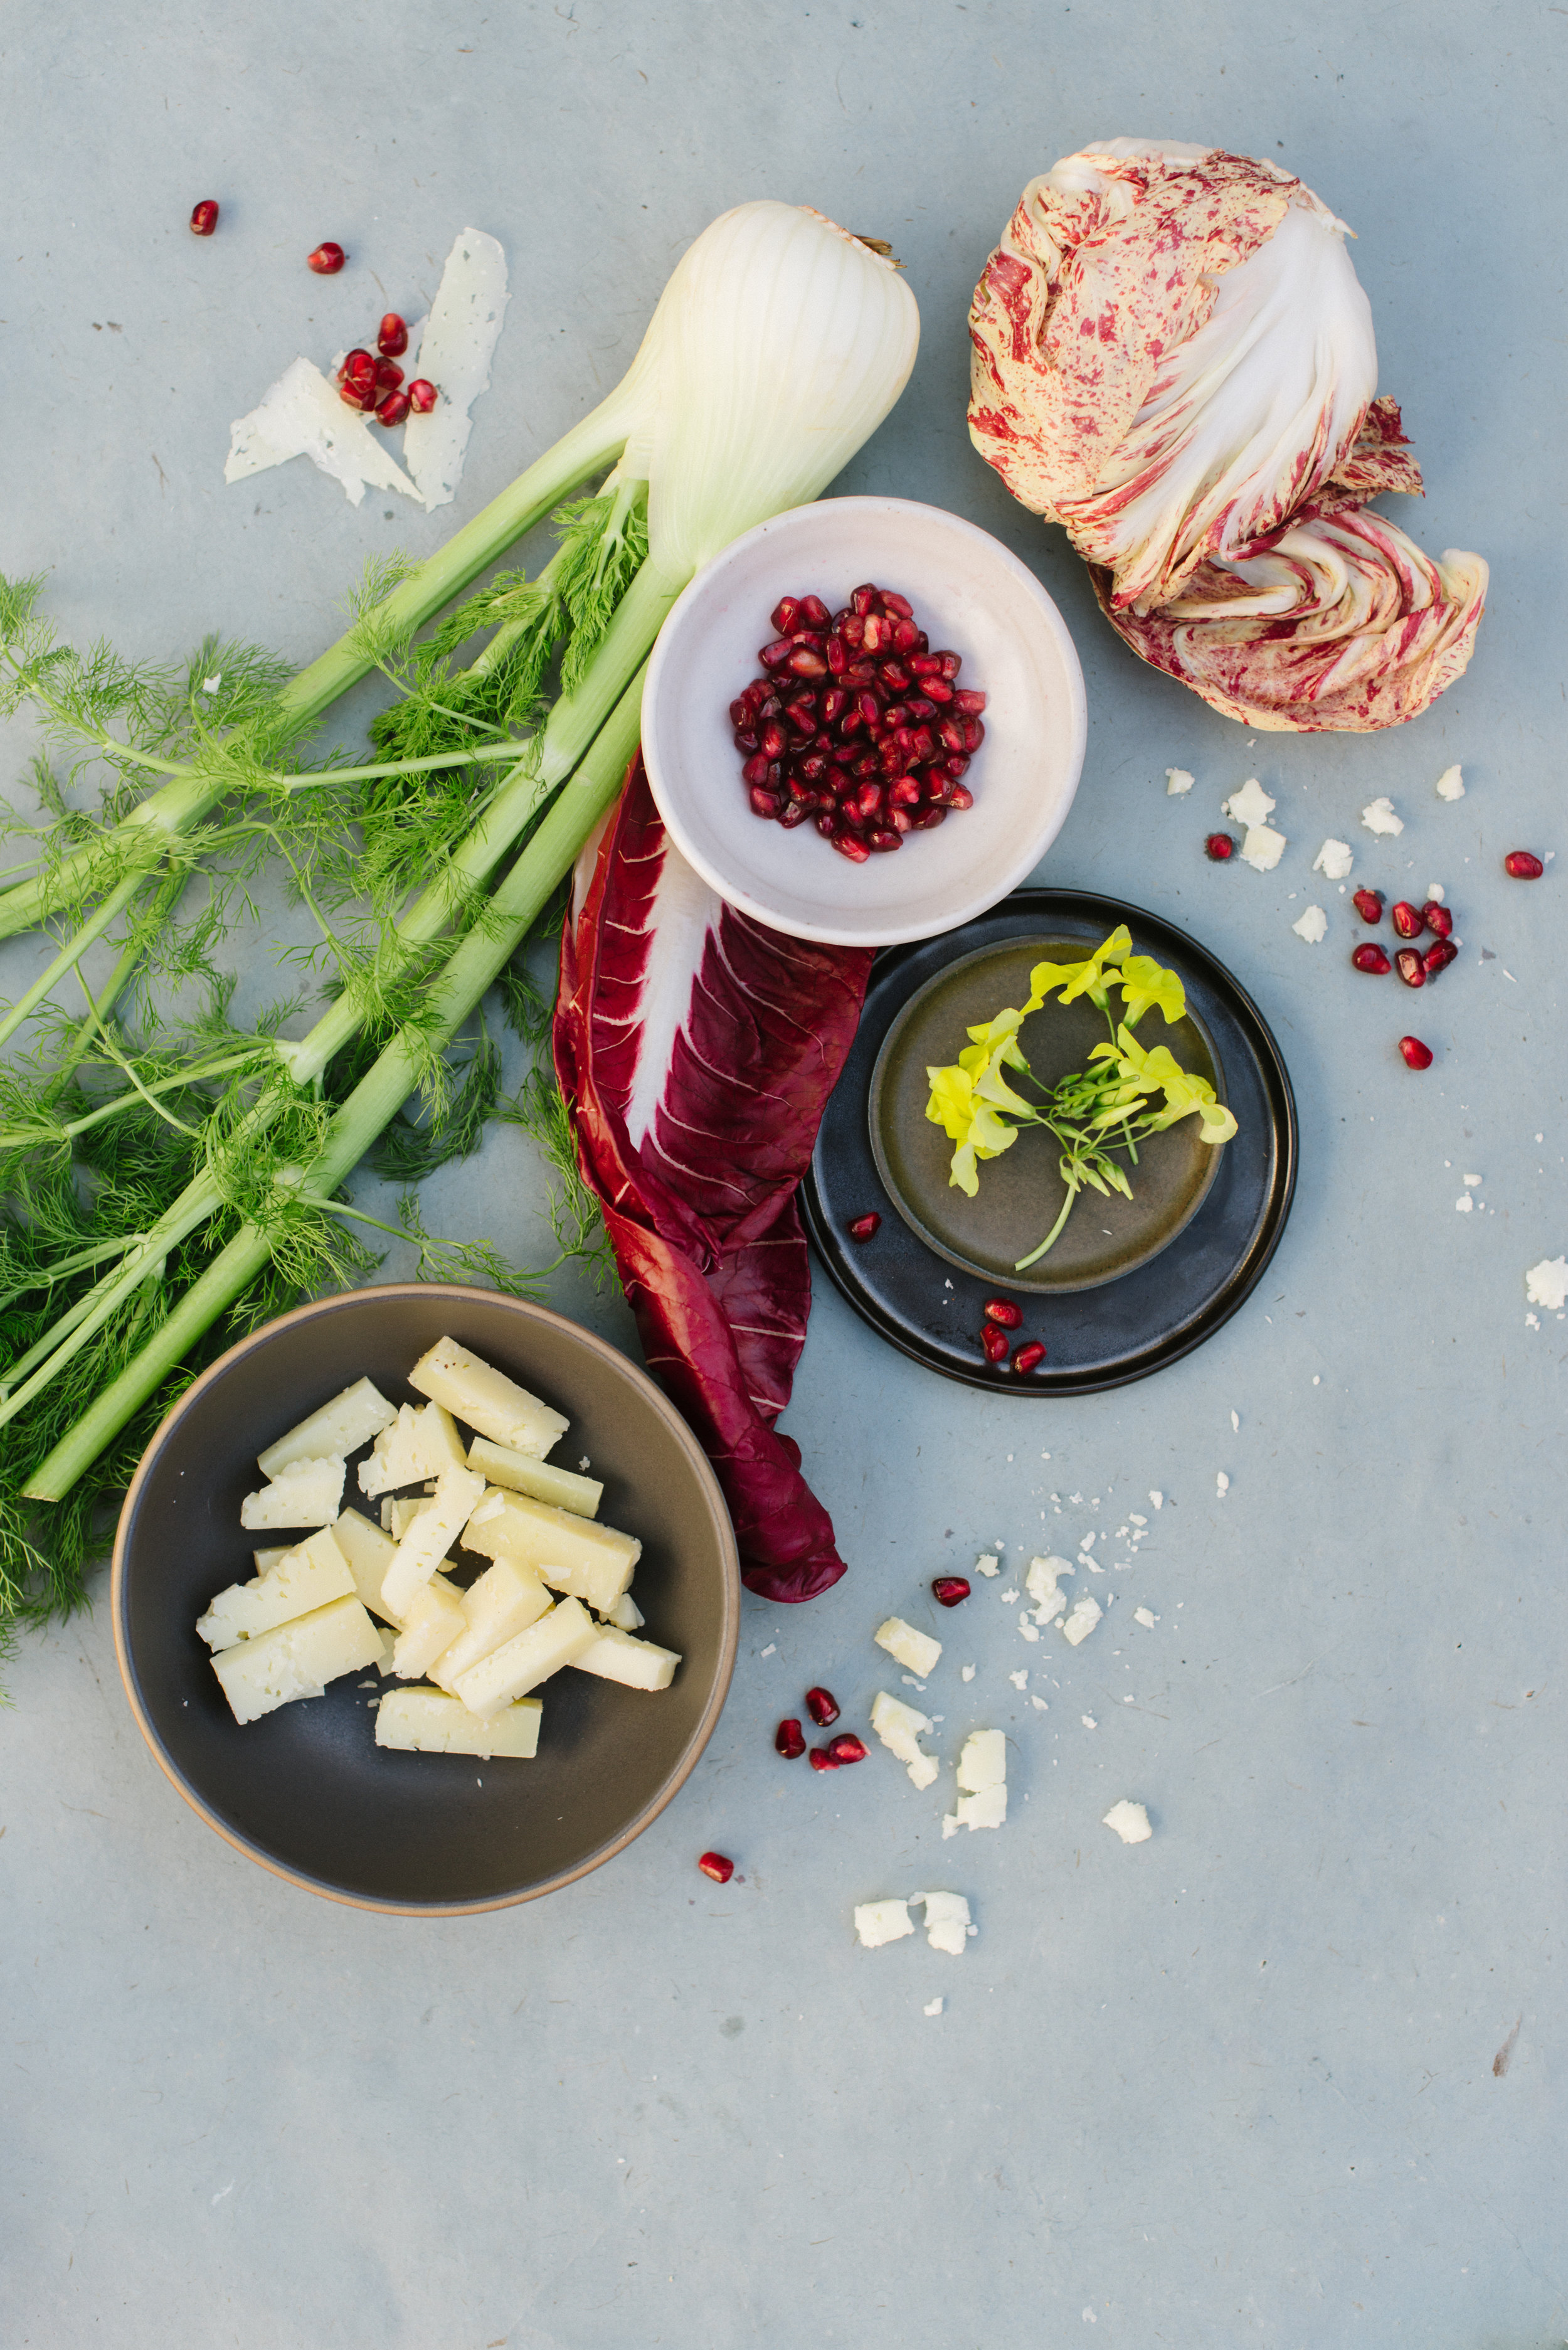 winter-chicory-salad-ingredients.jpg